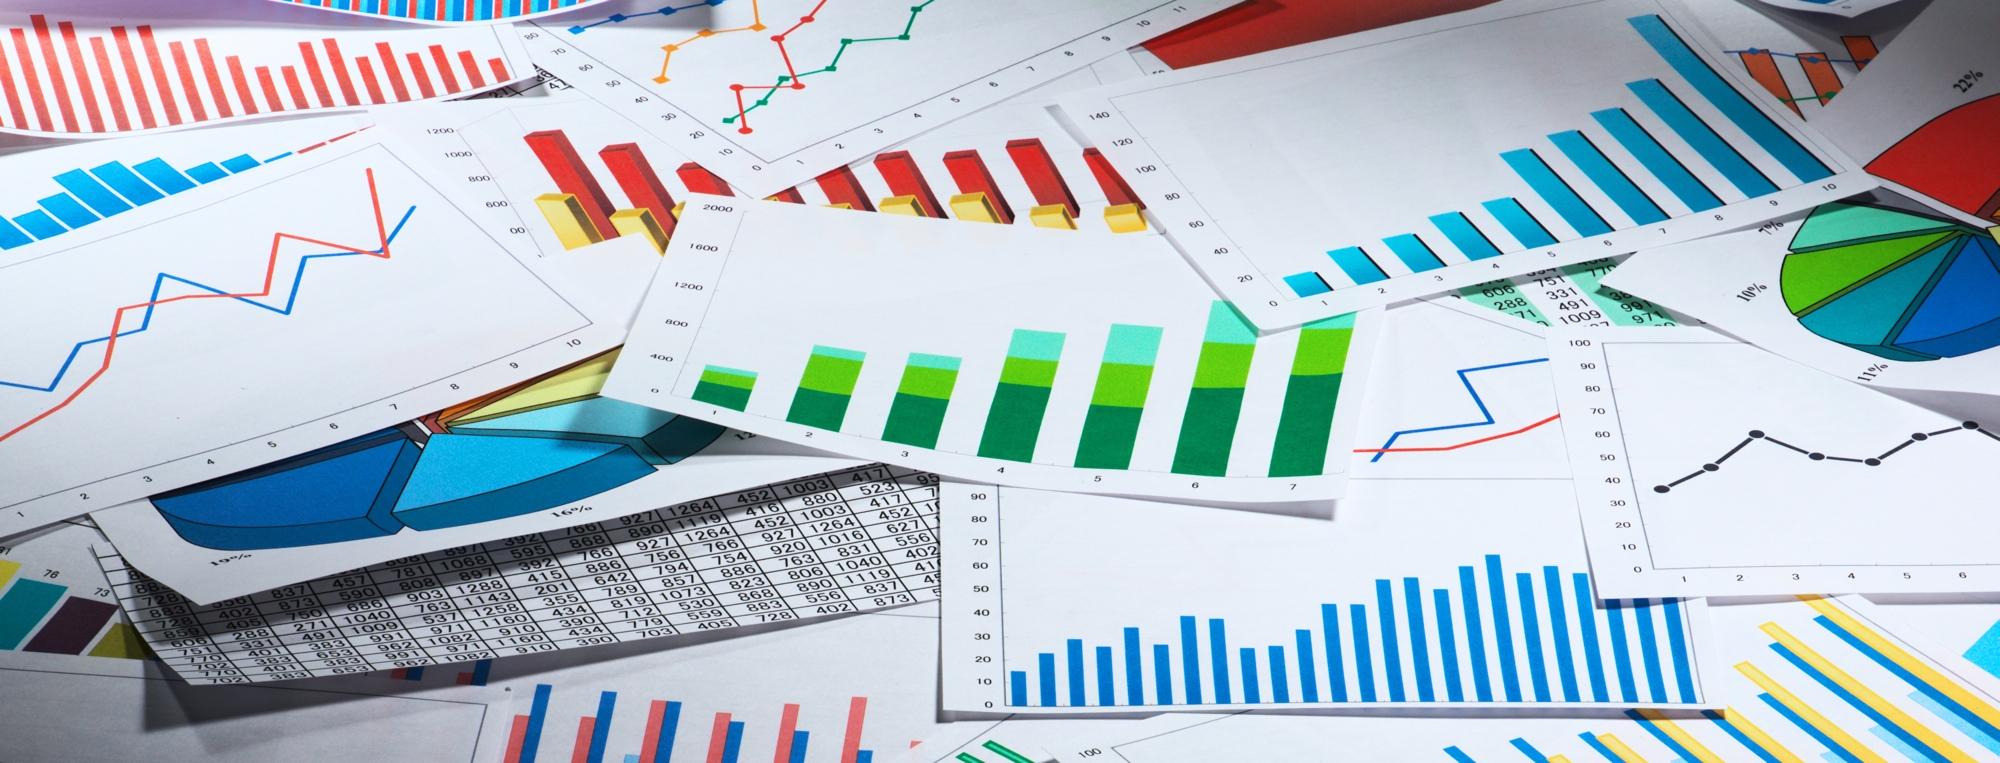 Formisimo, 'Google Analytics for Web forms', Exits Beta